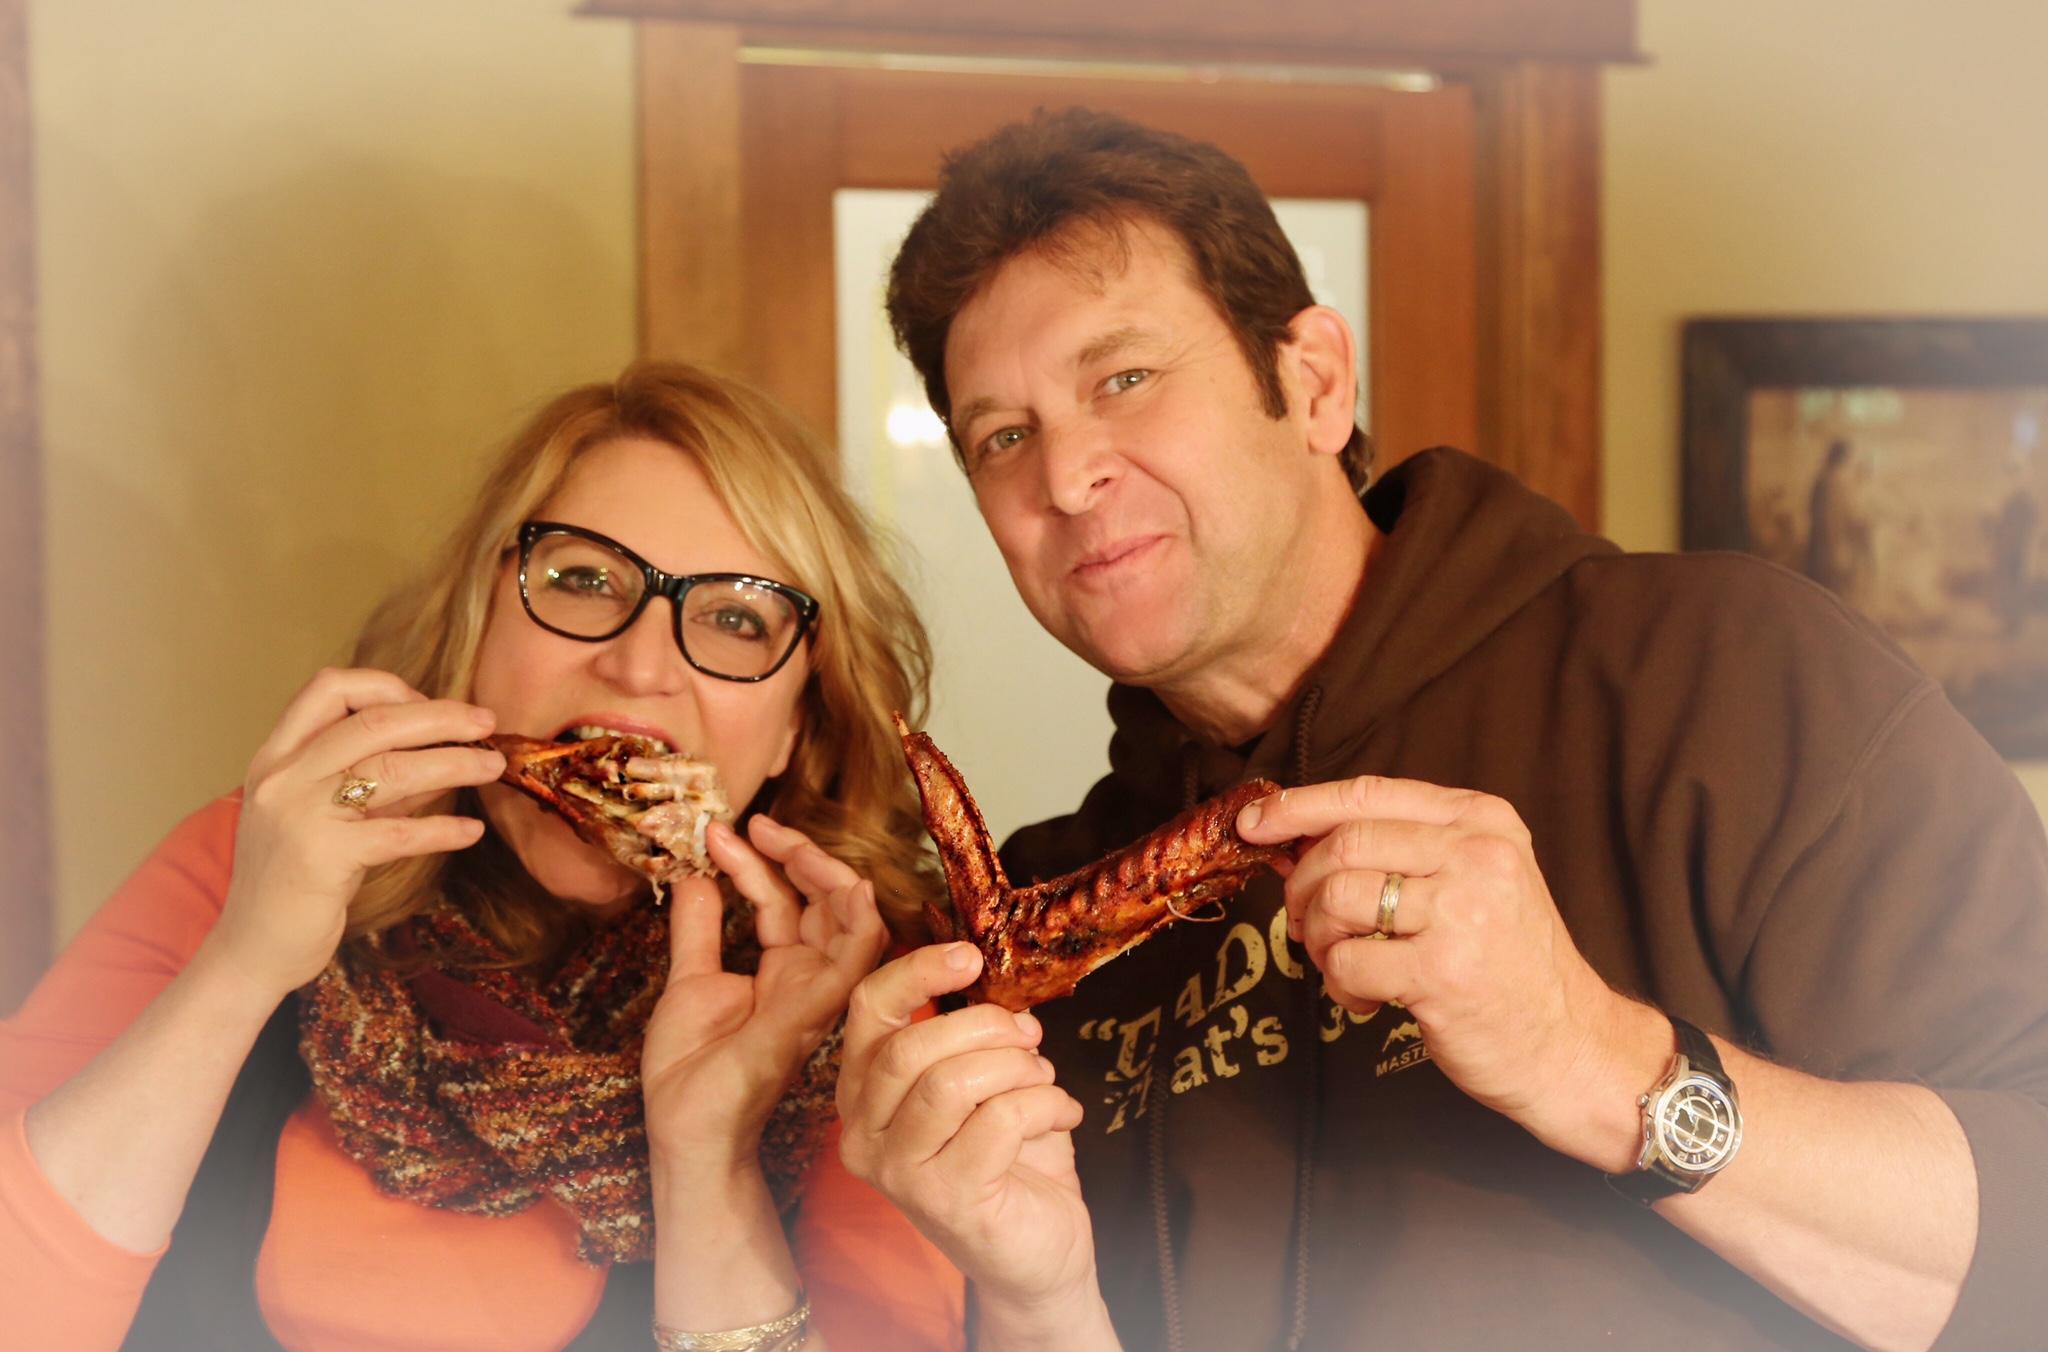 Me and Mr. Masterbuilt, John McLemore enjoying some deep-fried turkey! Mmmmmm...